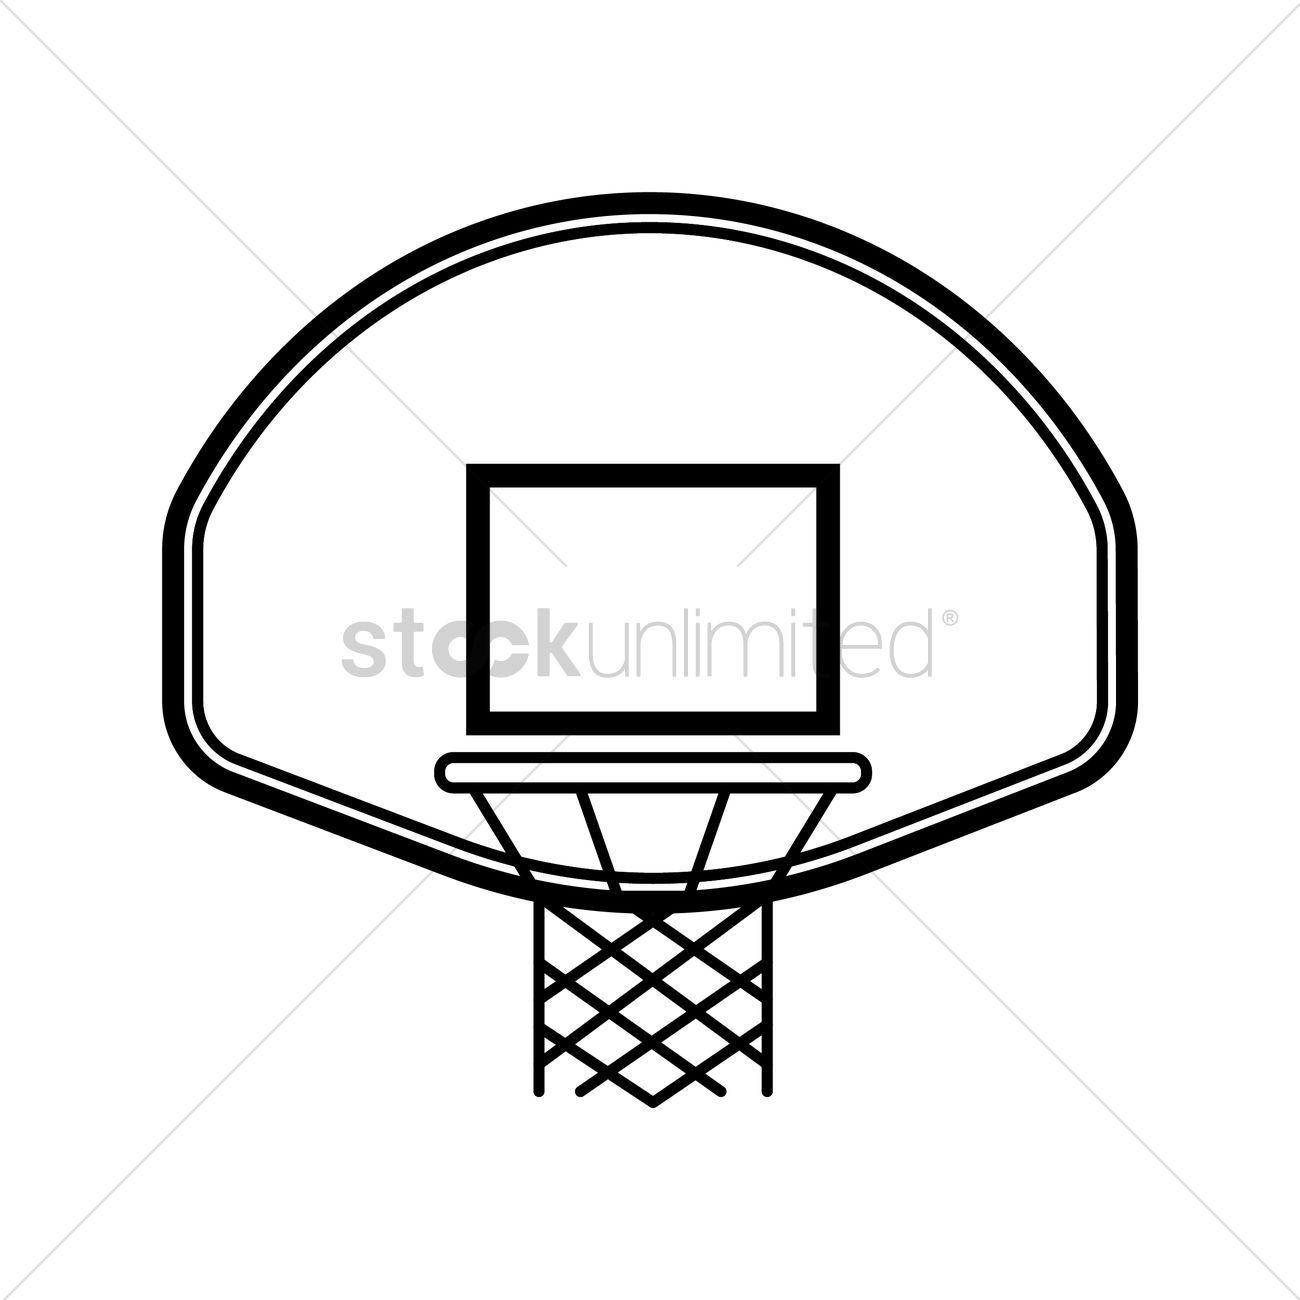 Basketball Backboard And Rim Vector Image